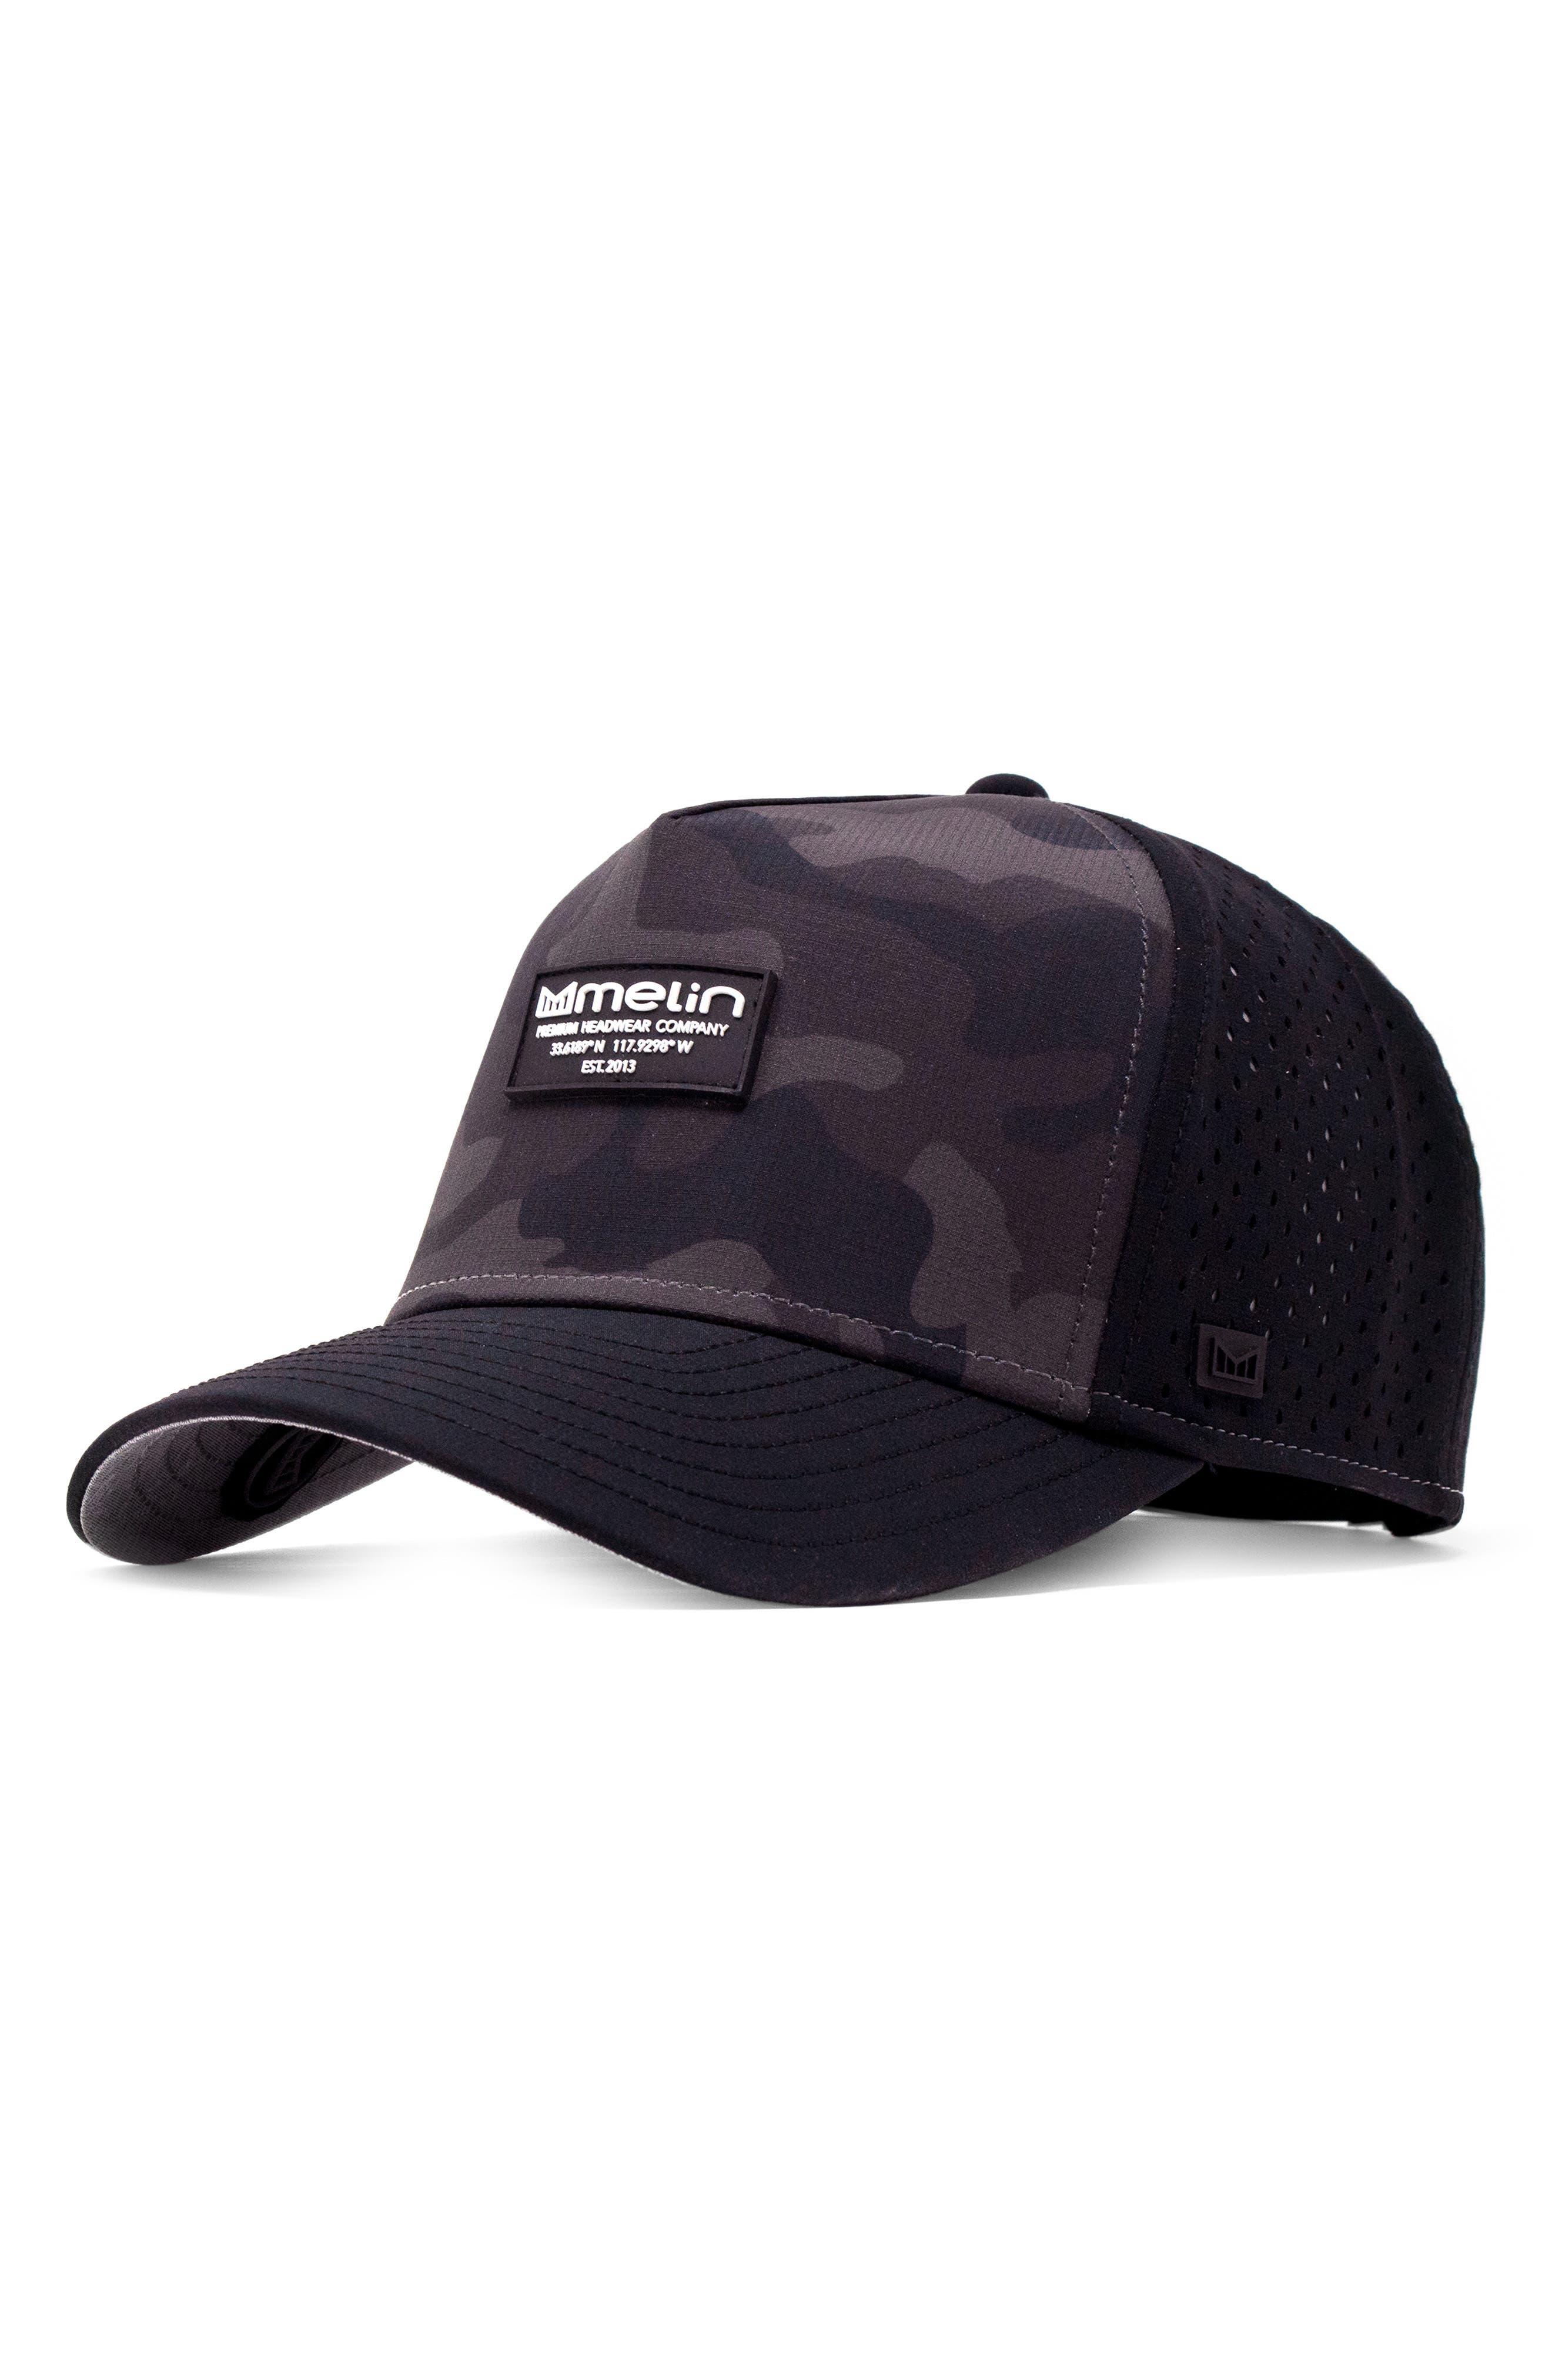 Odyssey Brick Hydro Baseball Cap